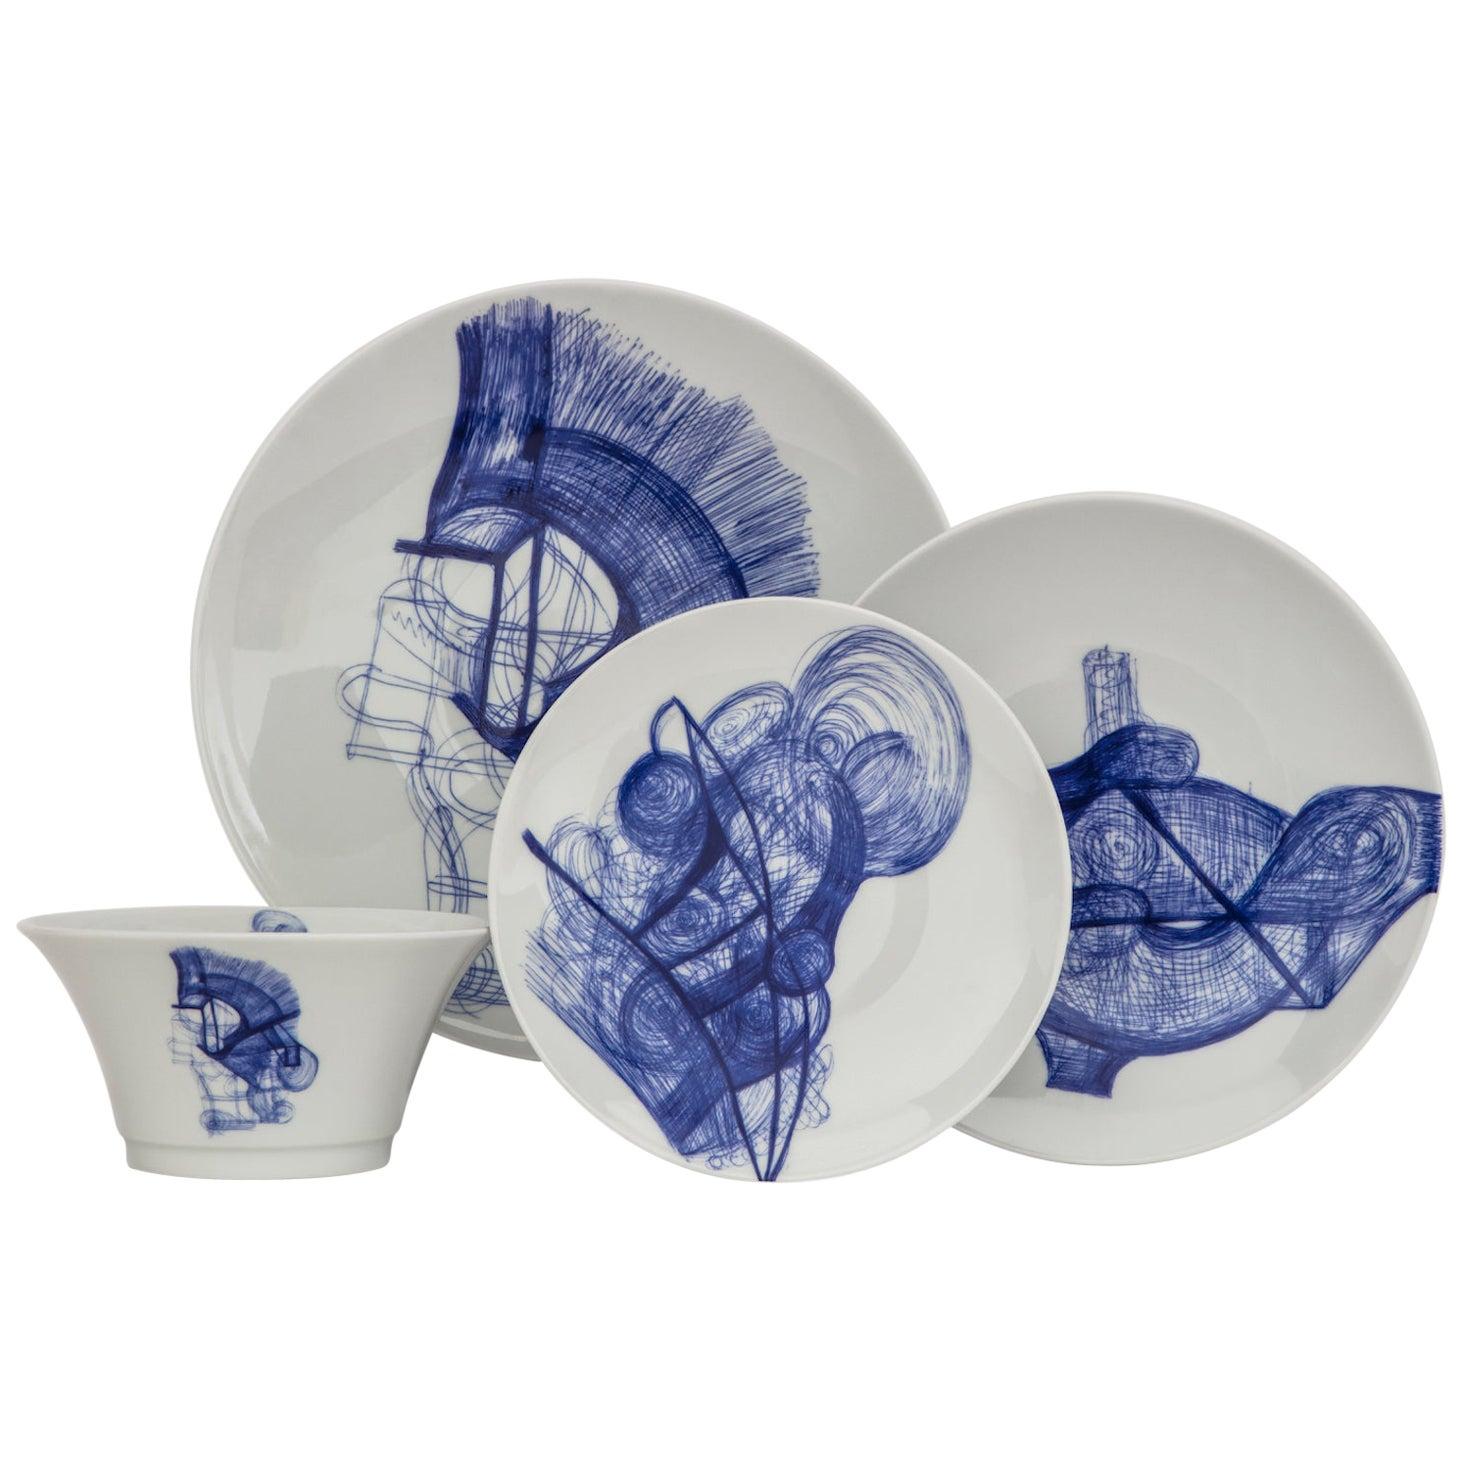 Delft Blue White French Limoges 4-Piece Porcelain Dinner Setting, Plates Bowl